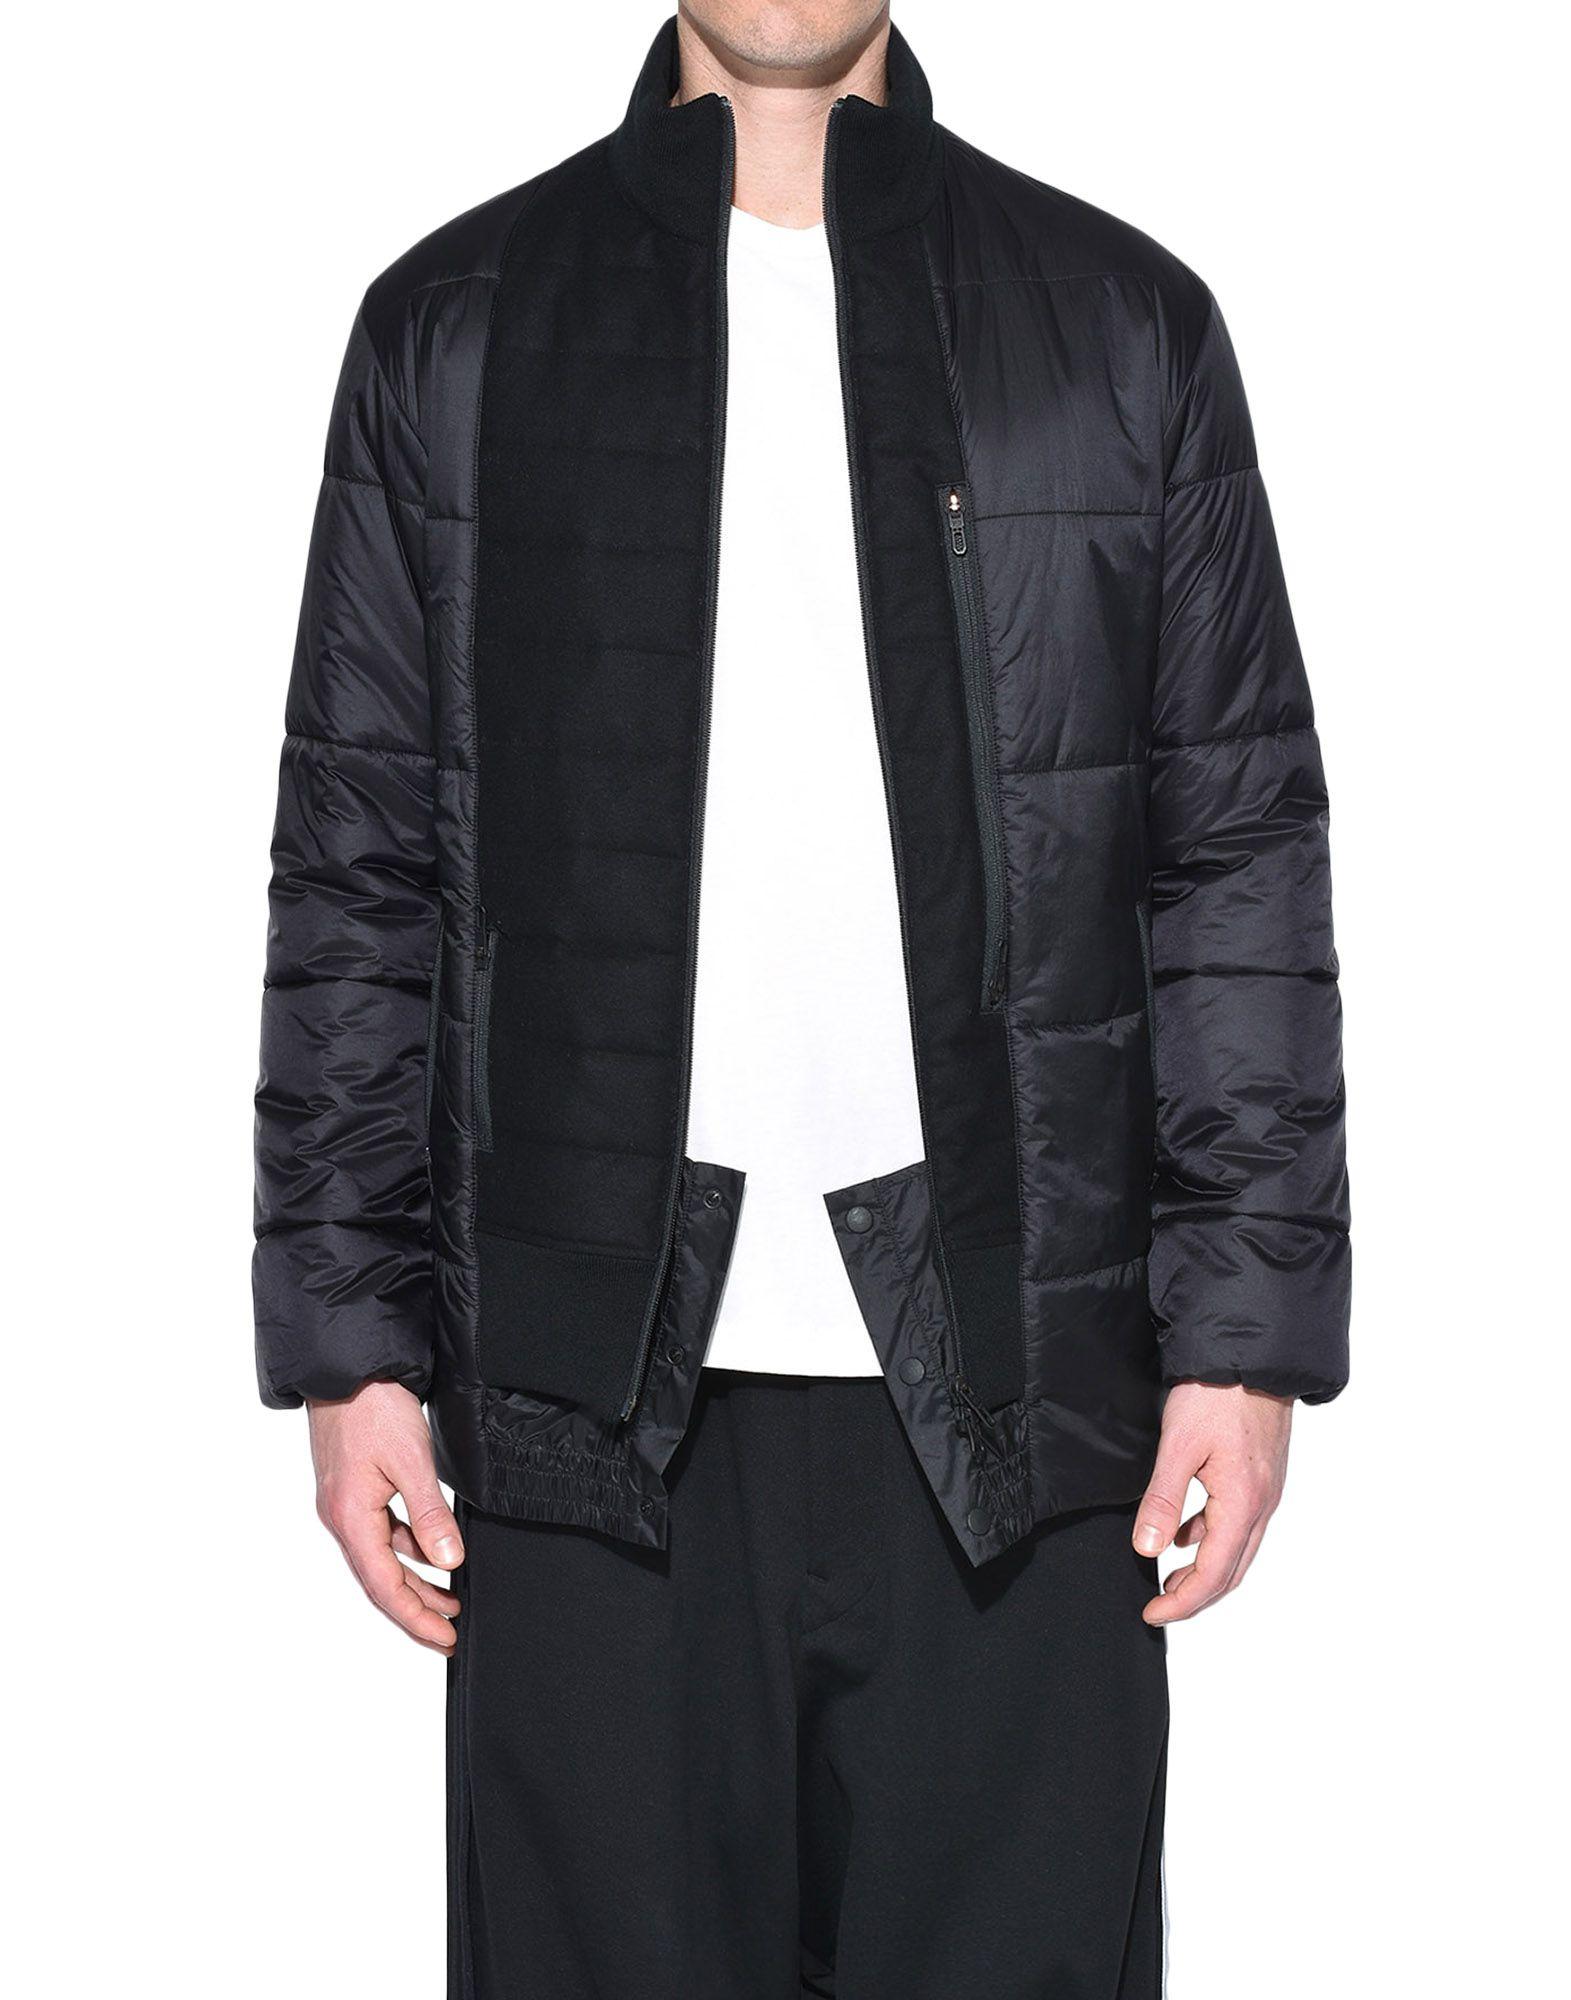 Y-3 Y-3 Patchwork Down Jacket Down jacket Man r